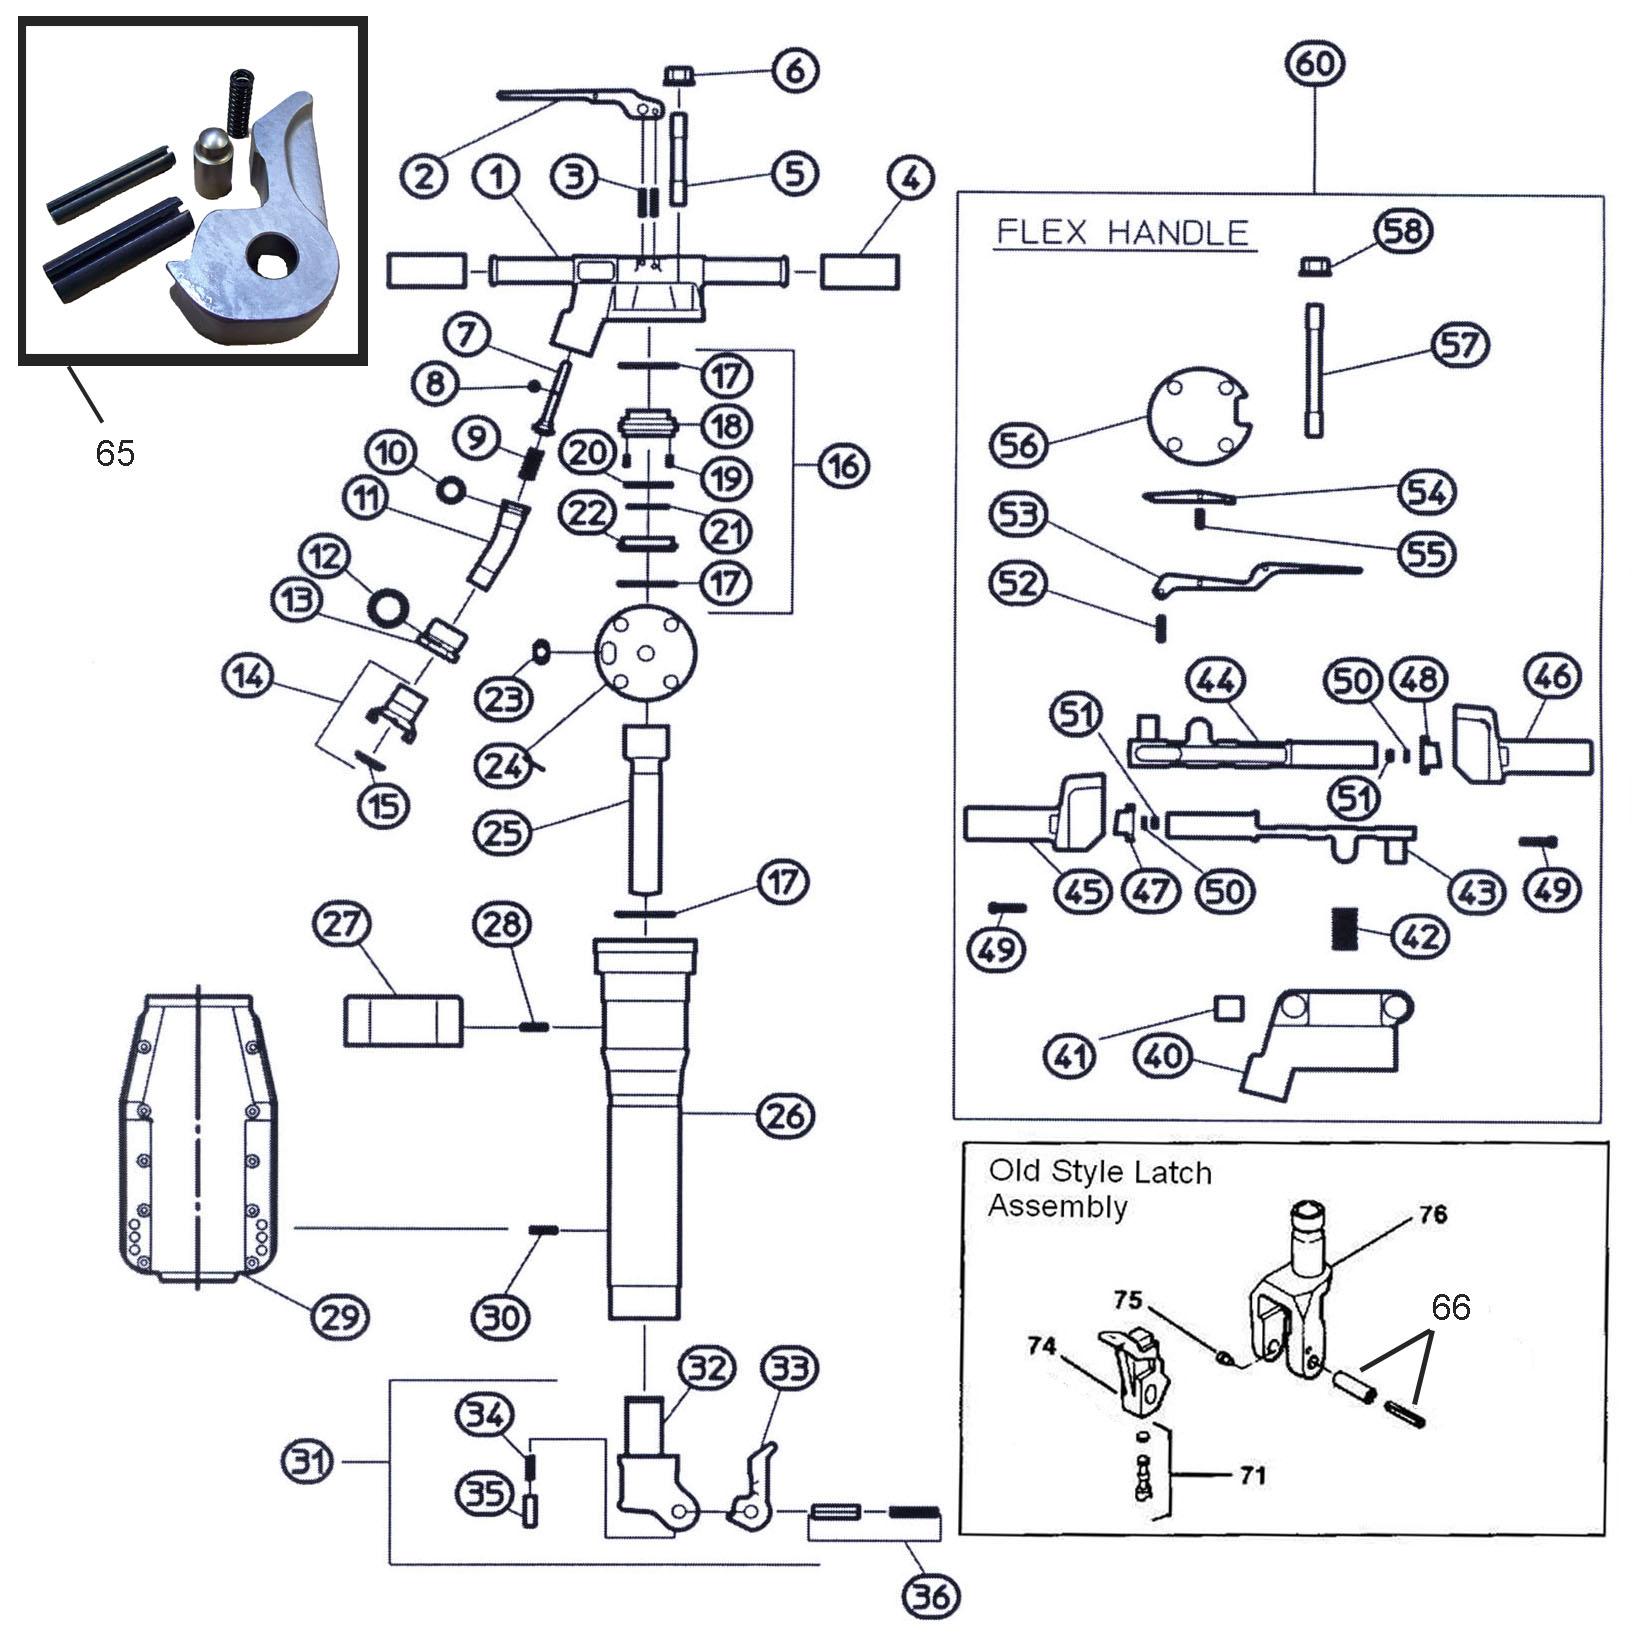 87 Harley Sportster Wiring Diagram. Diagram. Auto Wiring